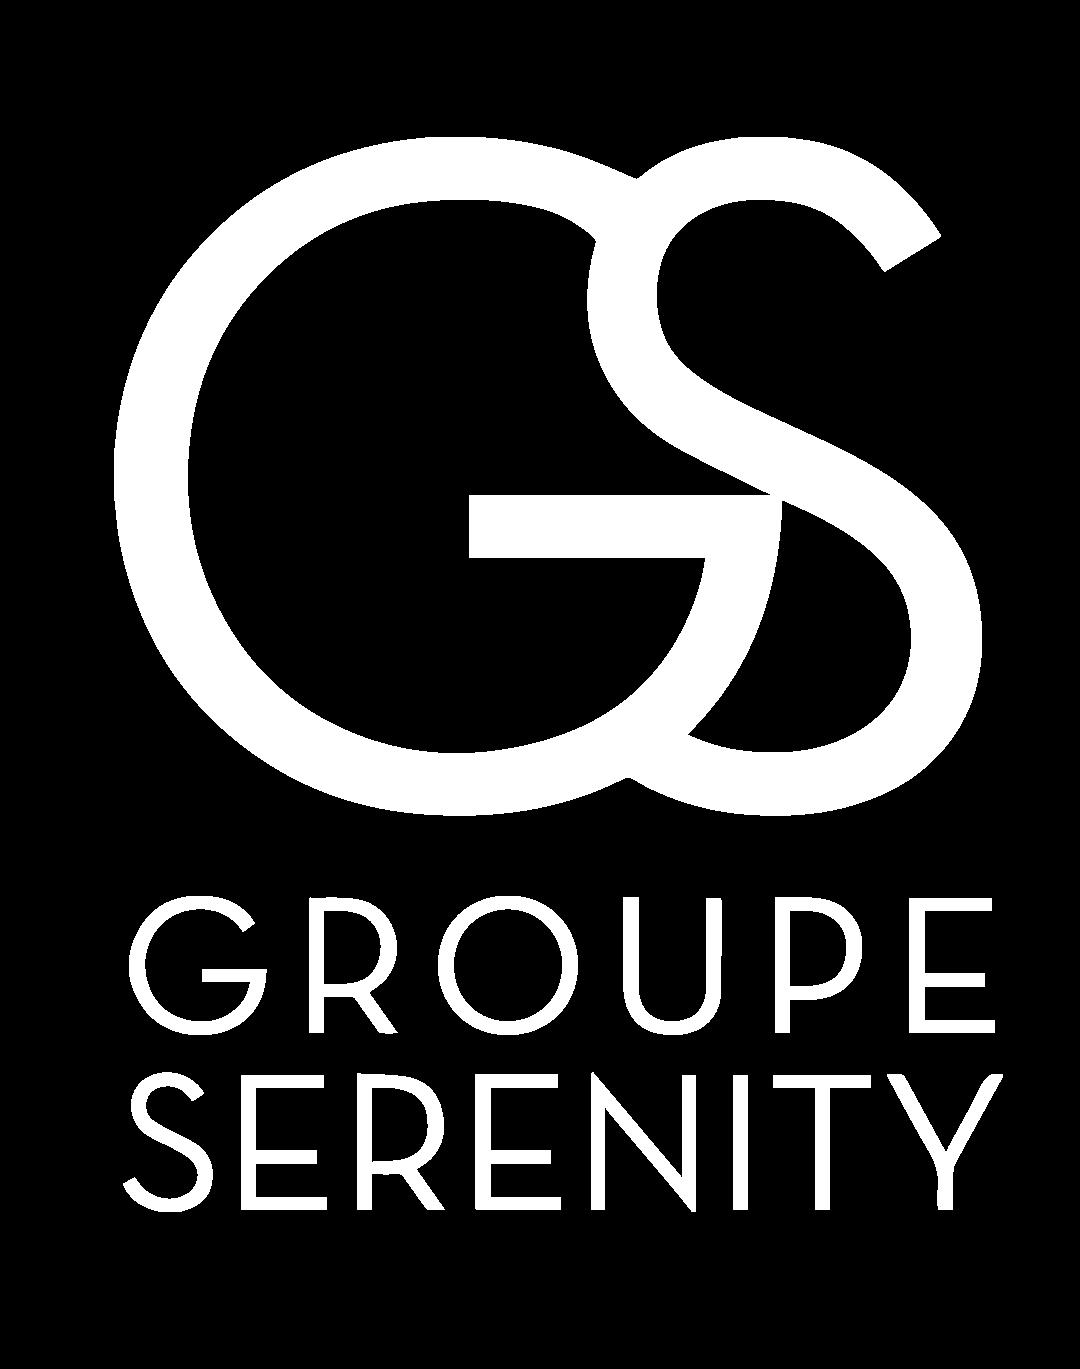 Groupe Serenity